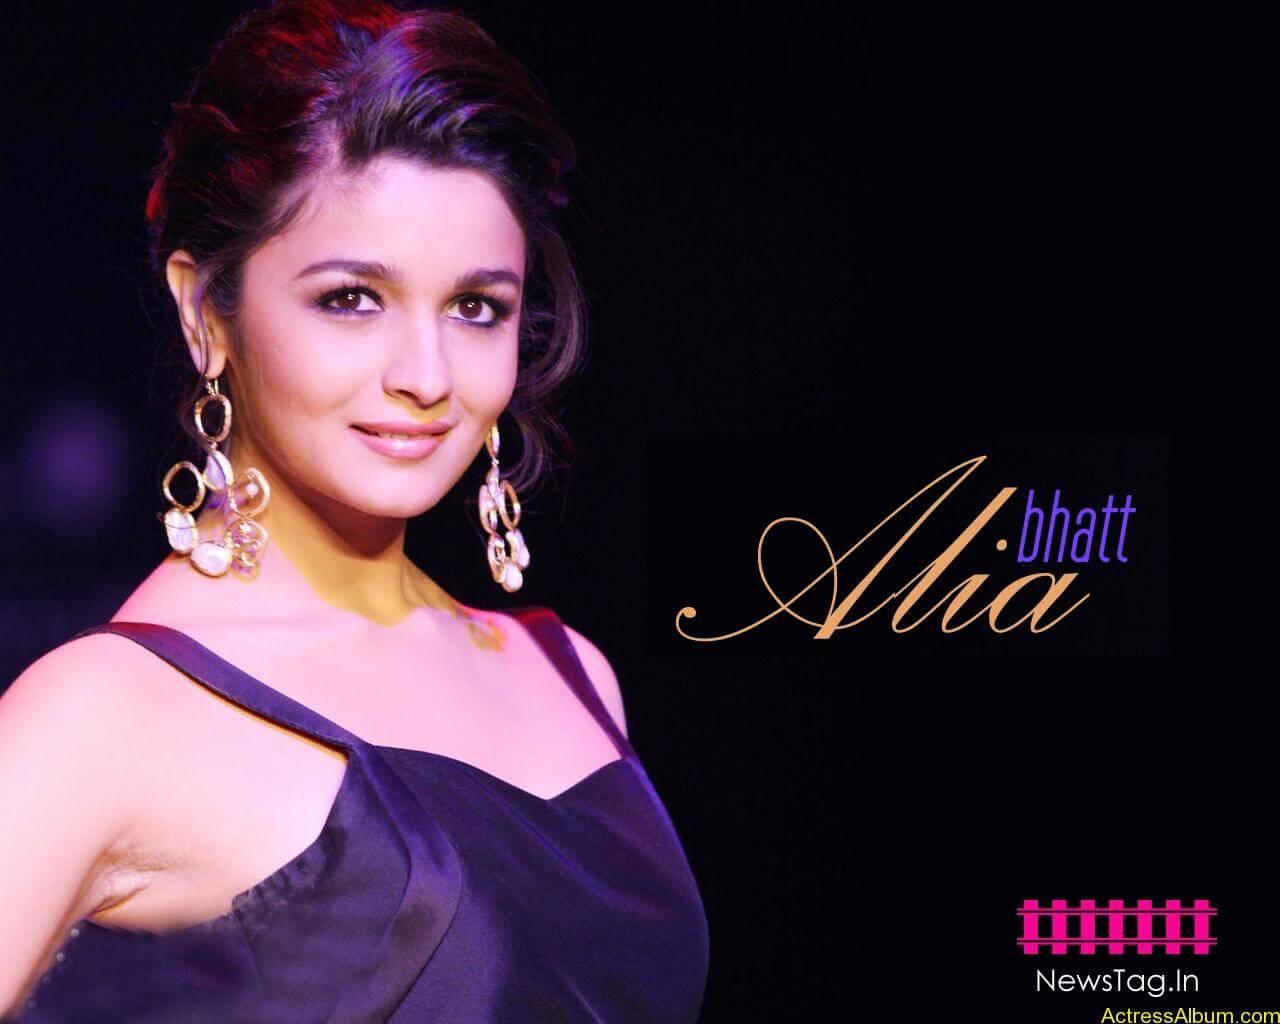 Alia-Bhatt-Photo-Shoot-for-Harper-Bazaar-Photos-9